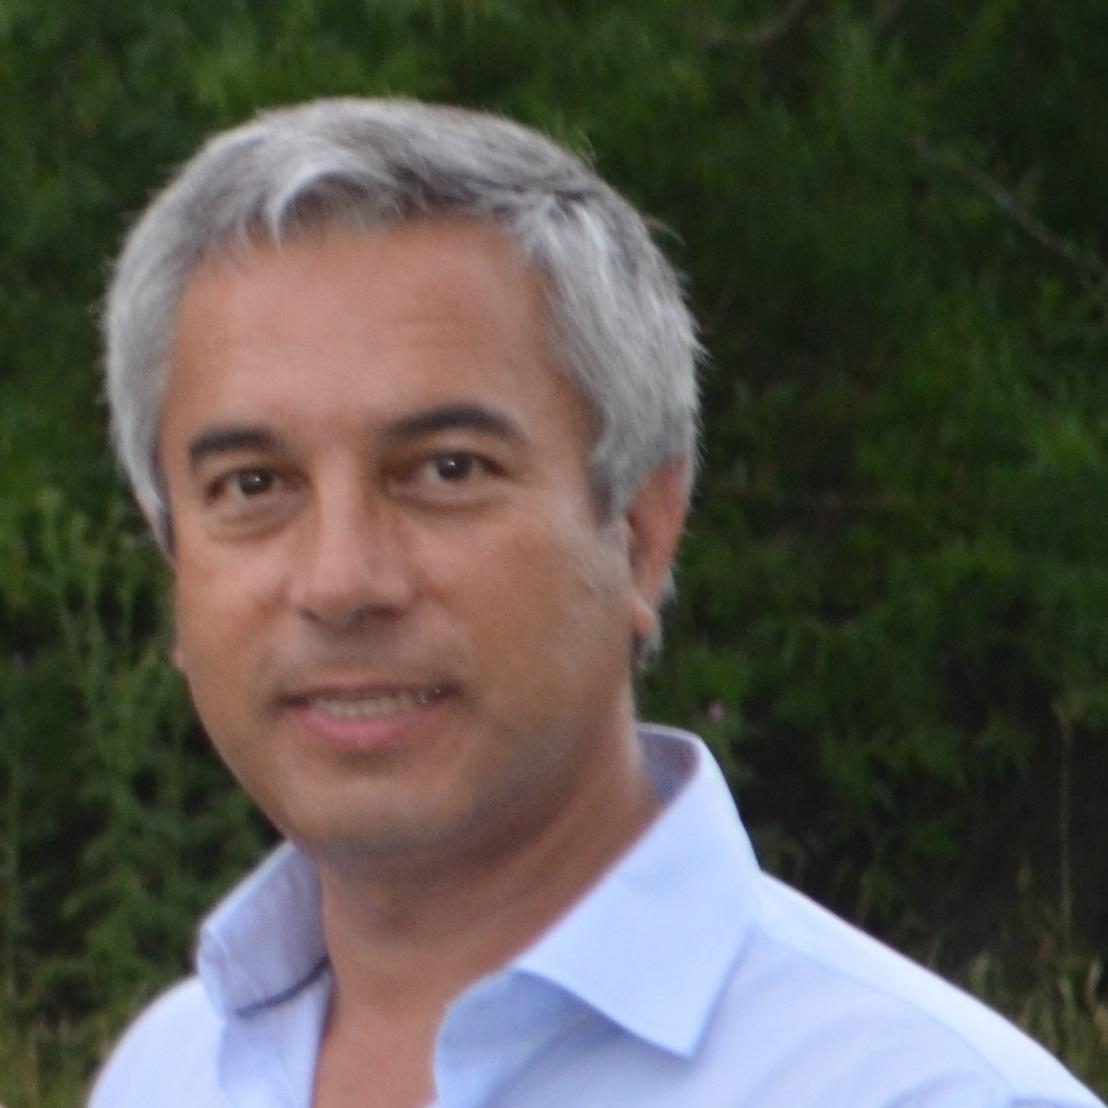 Daniel Lopez Vessena